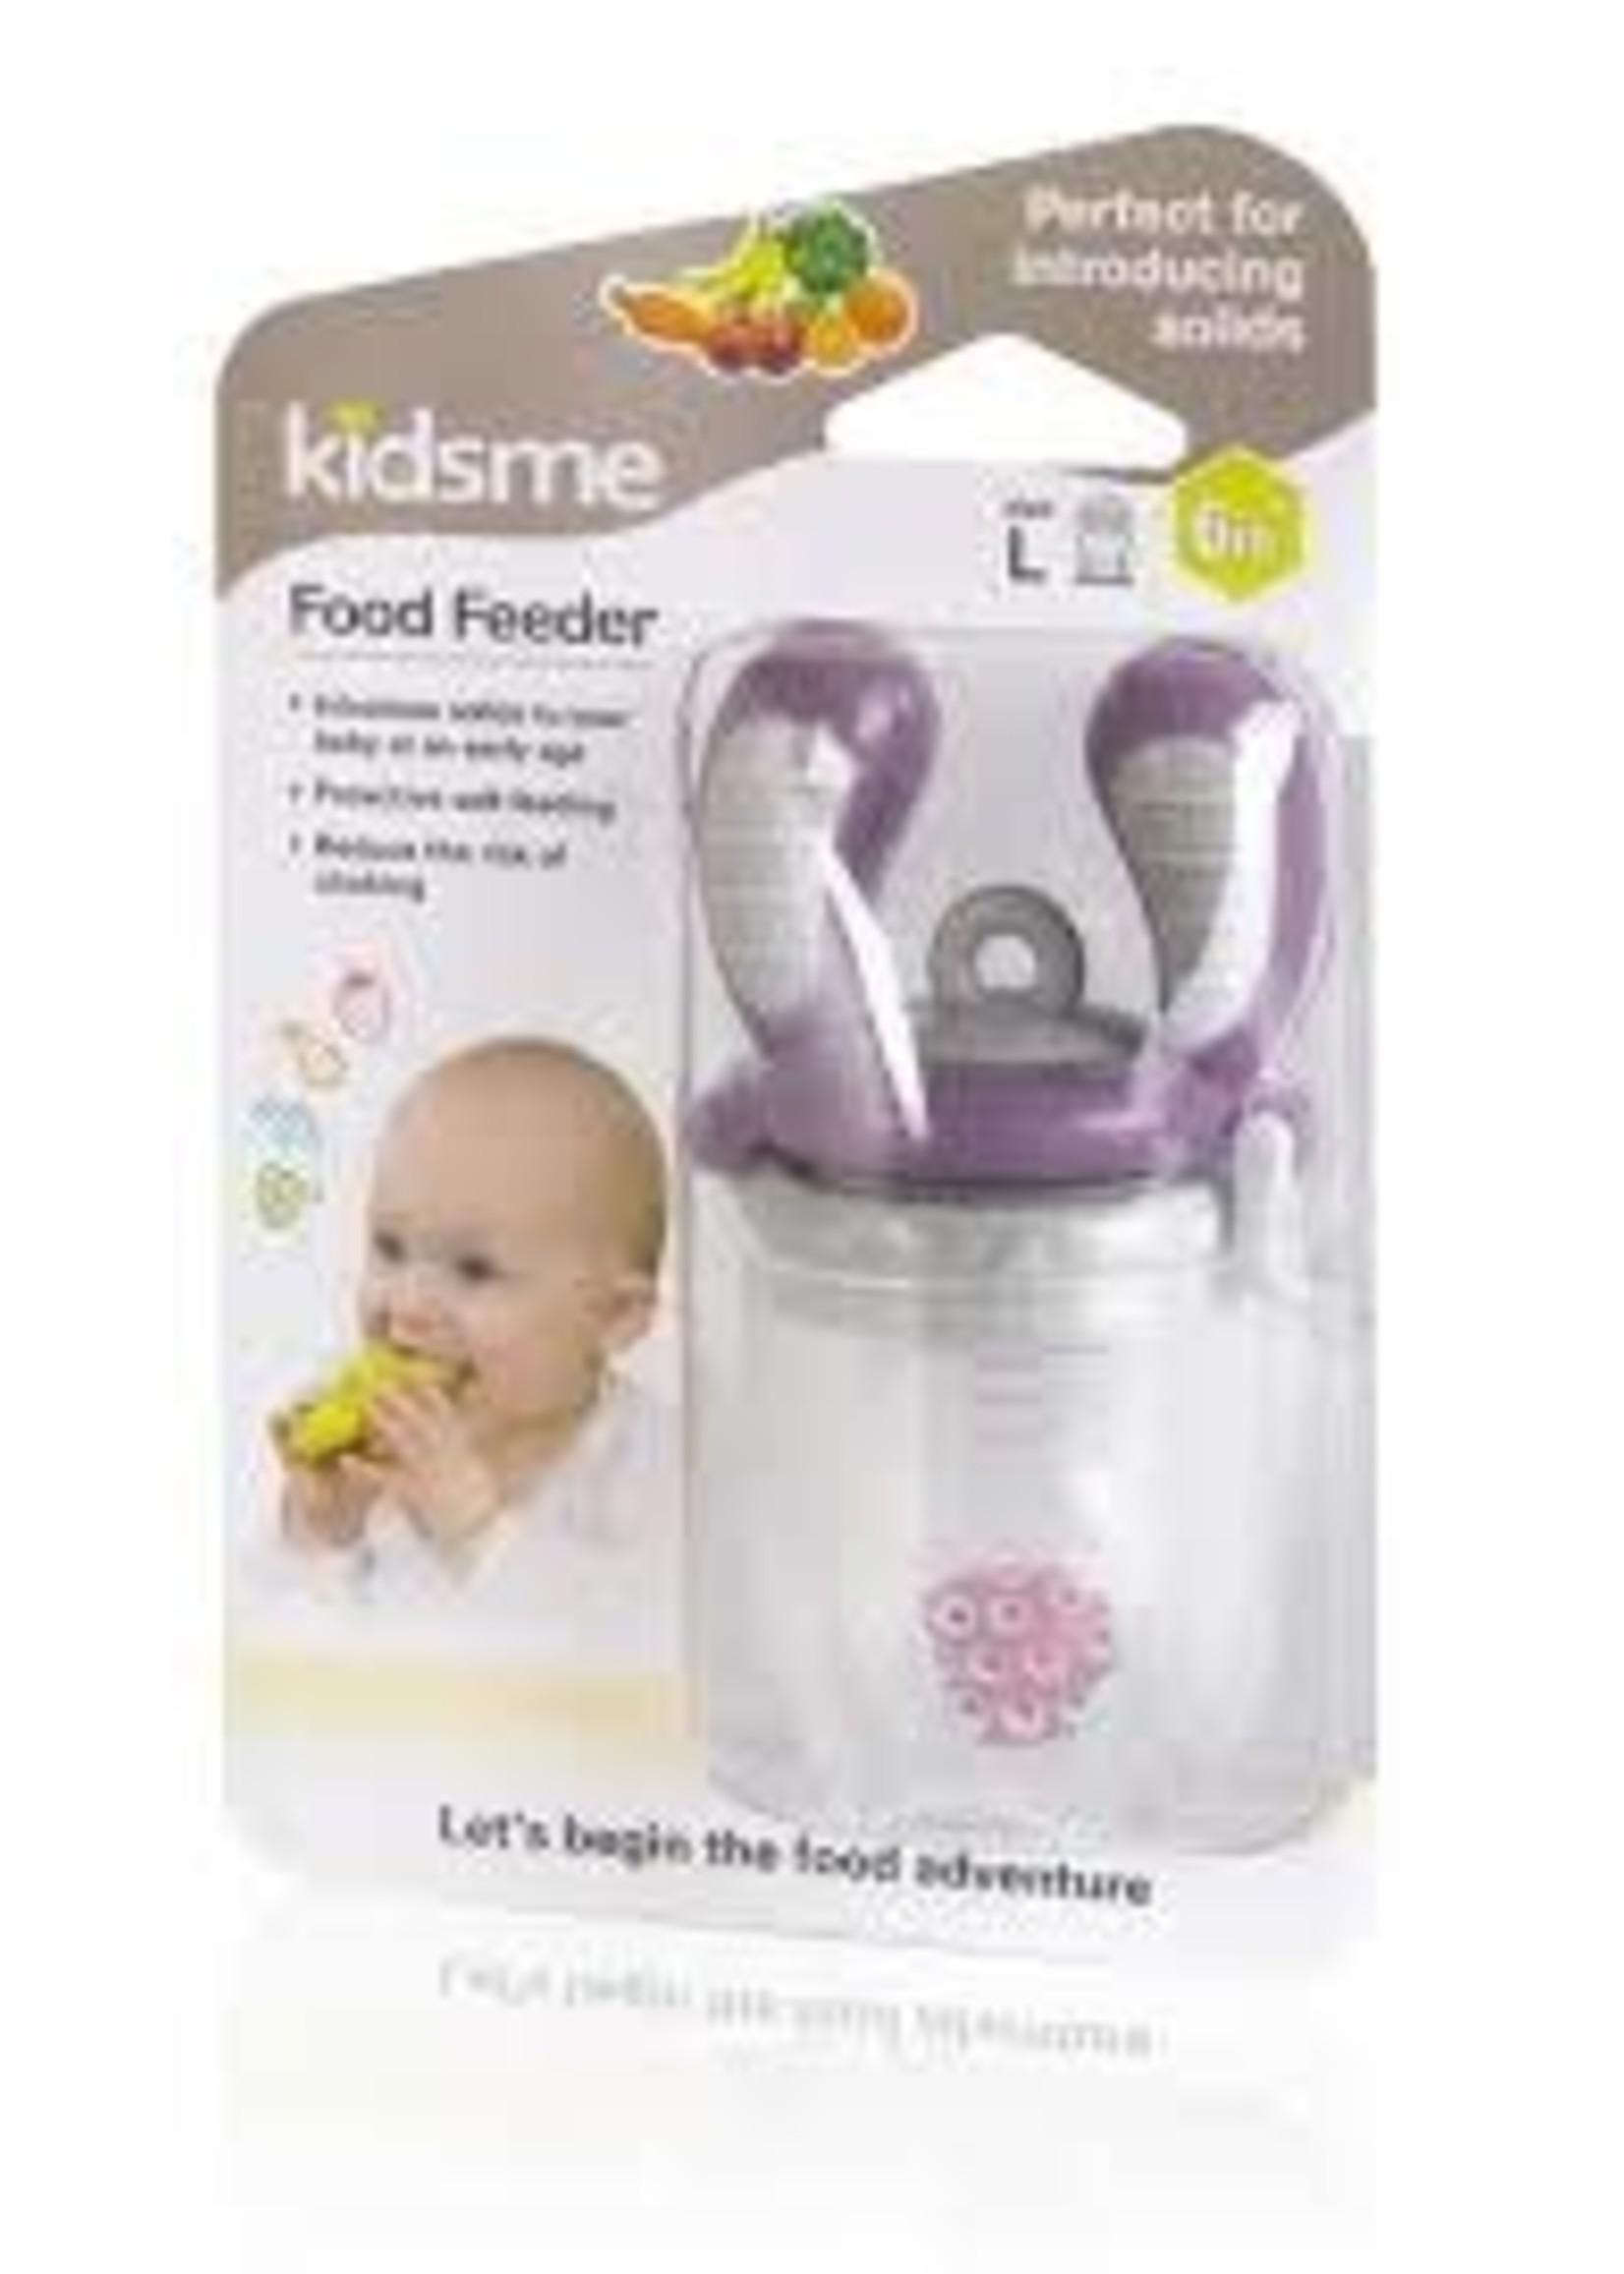 Kidsme Food Feeder